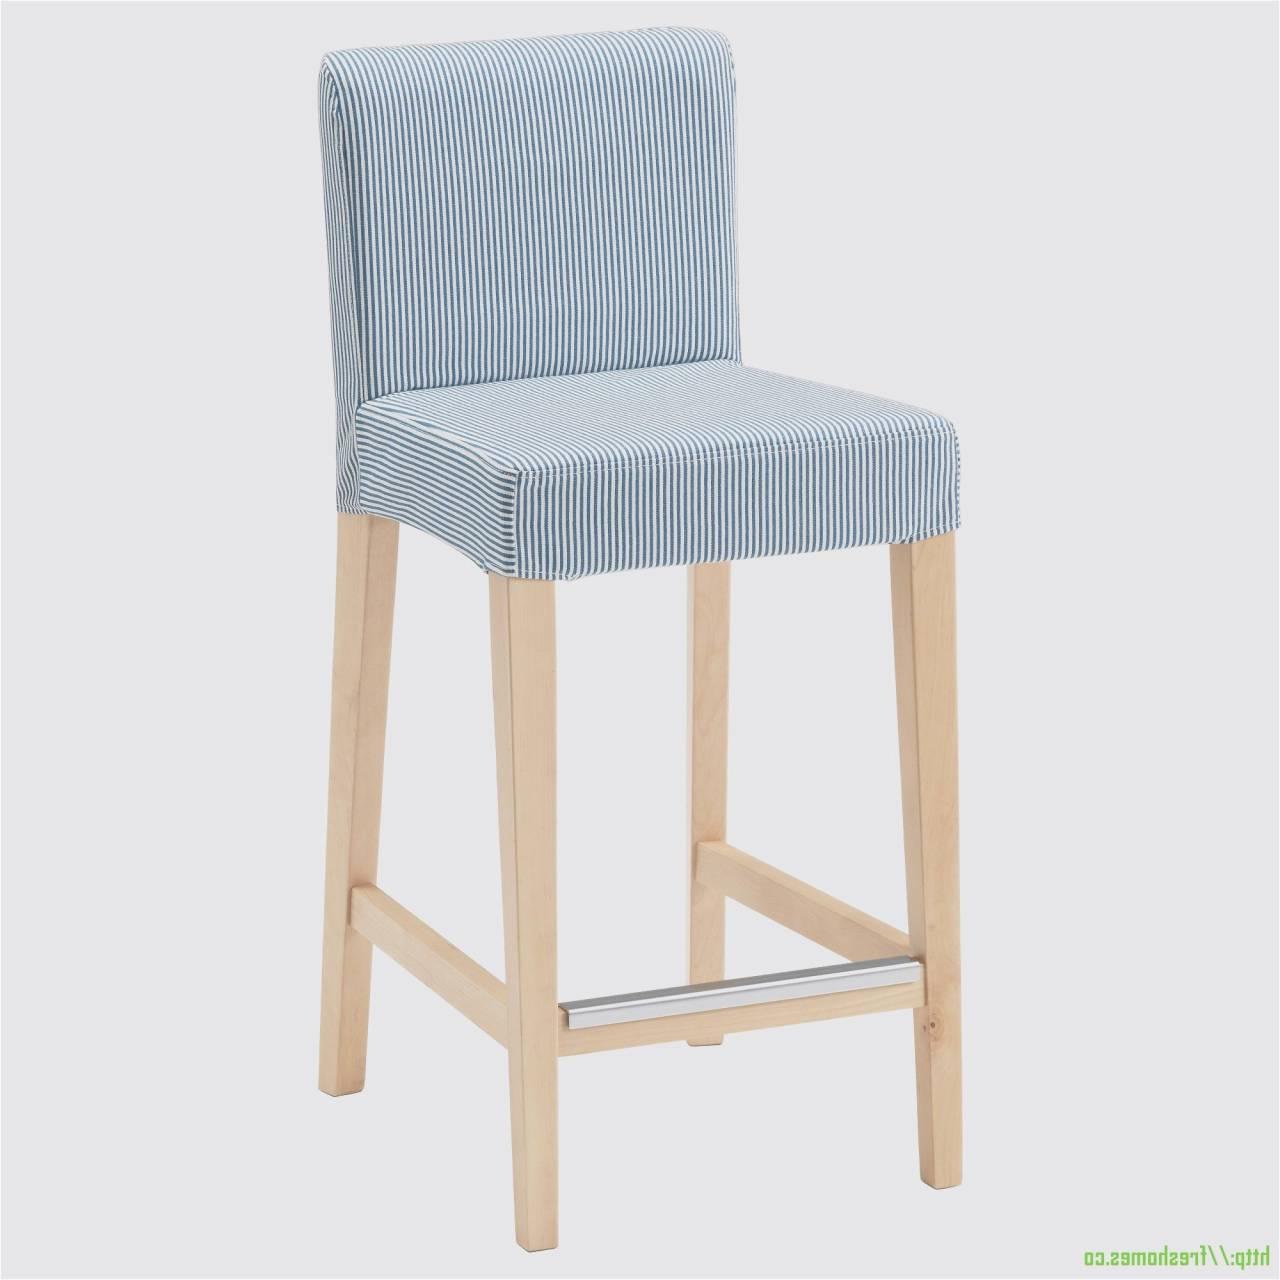 Coussin Chaise Jardin Ikea - Home Design concernant Chaises De Jardin Ikea